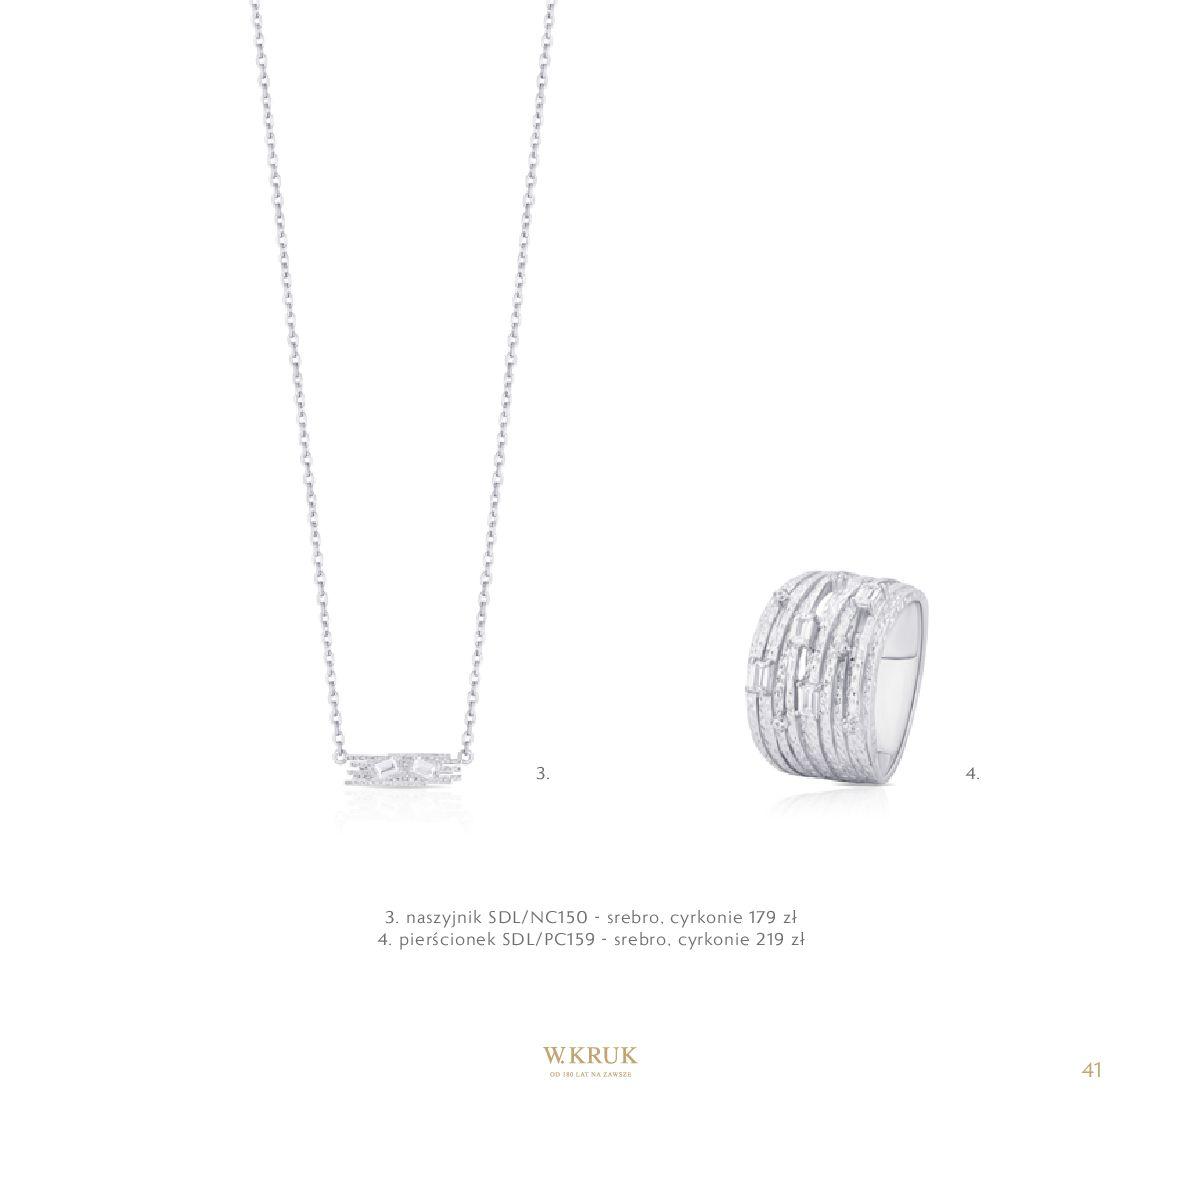 Gazetka W. KRUK: Katalog - Kolekcja Blask 2021-02-17 page-42